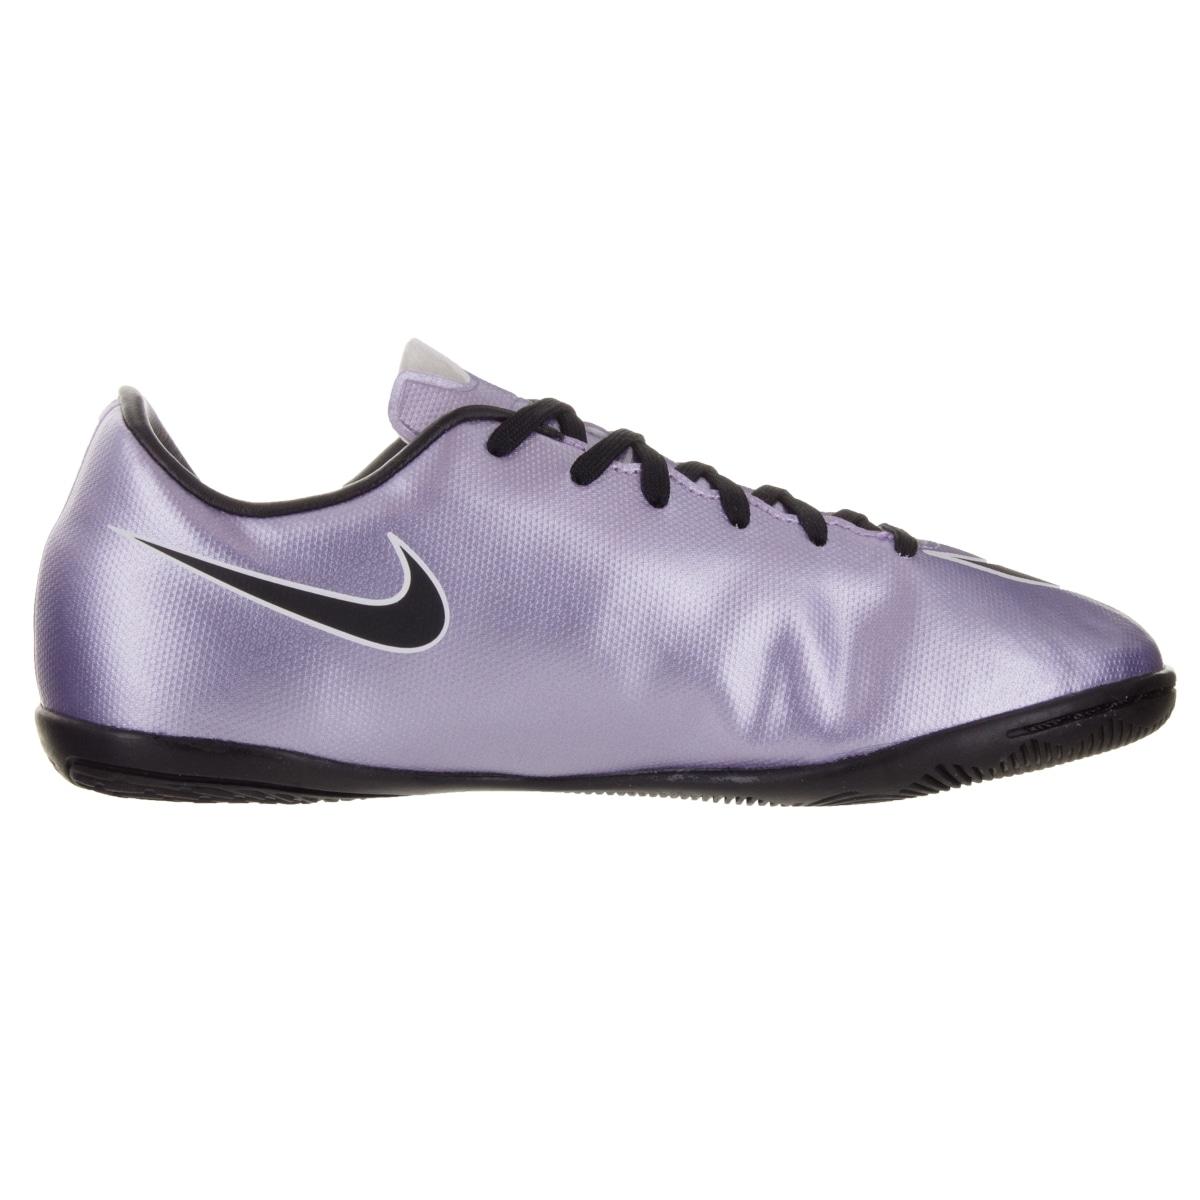 32b7e341687 Shop Nike Kids Jr Mercurial Victory V Ic Urban Lilac Black Brightt Magenta  White Indoor Soccer Shoe - Free Shipping Today - - 12330583